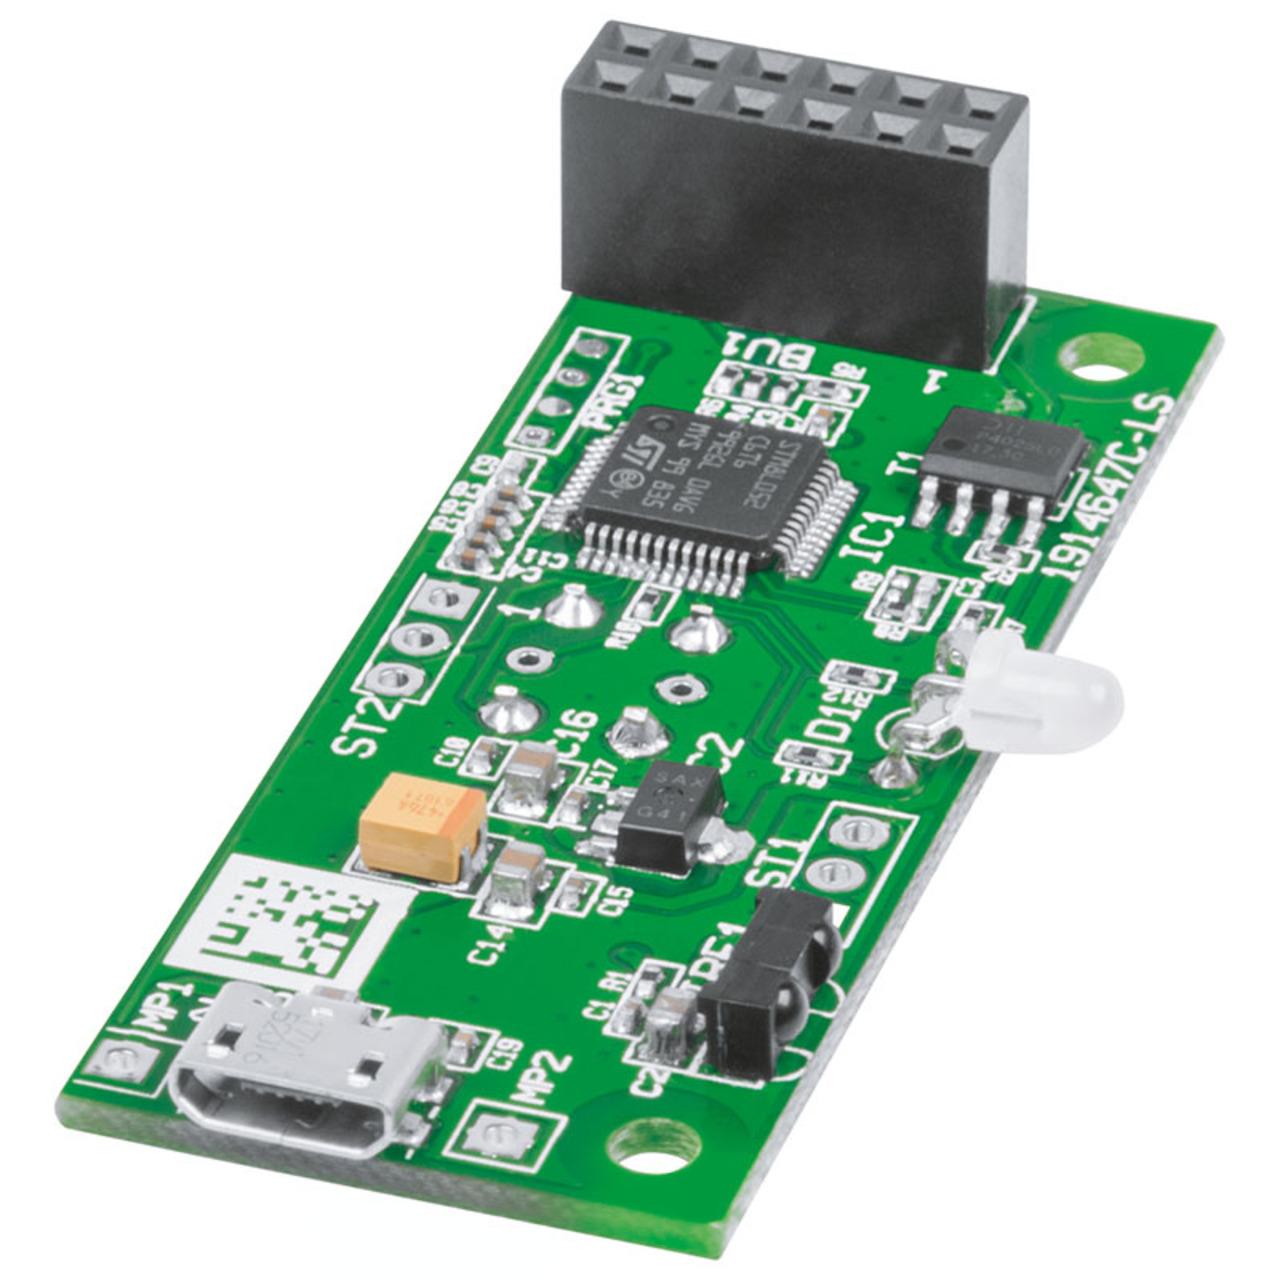 ELV Komplettbausatz Power Controller fund-252 r Raspberry Pi RPi-PC